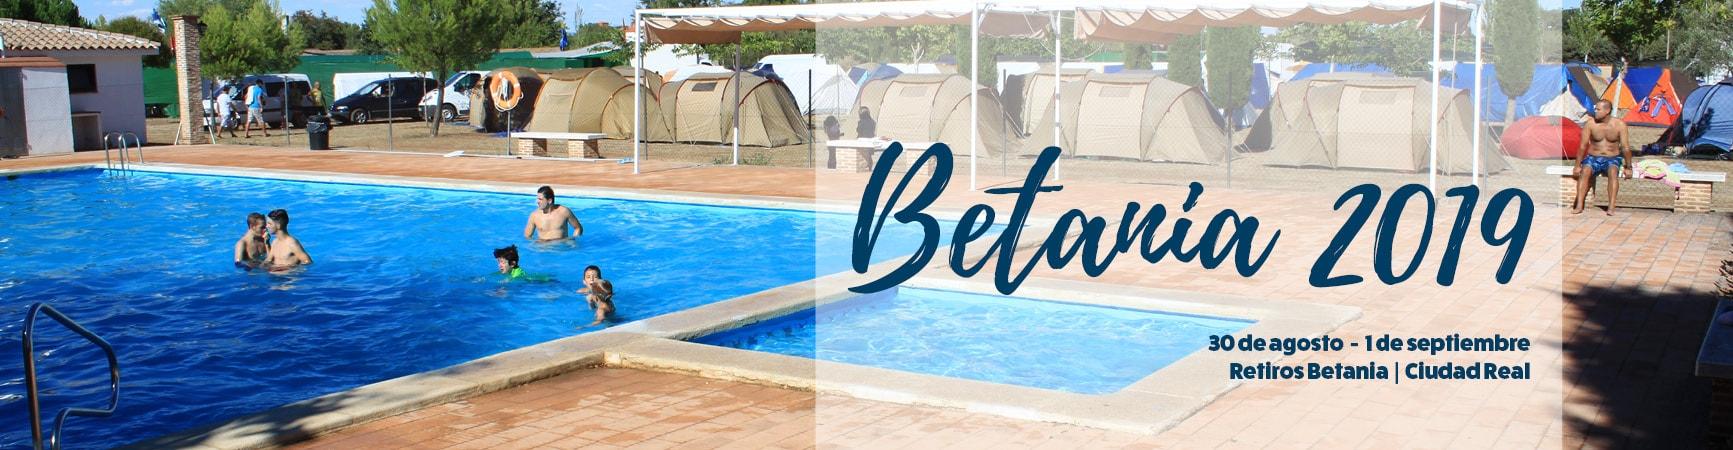 Betania 2019